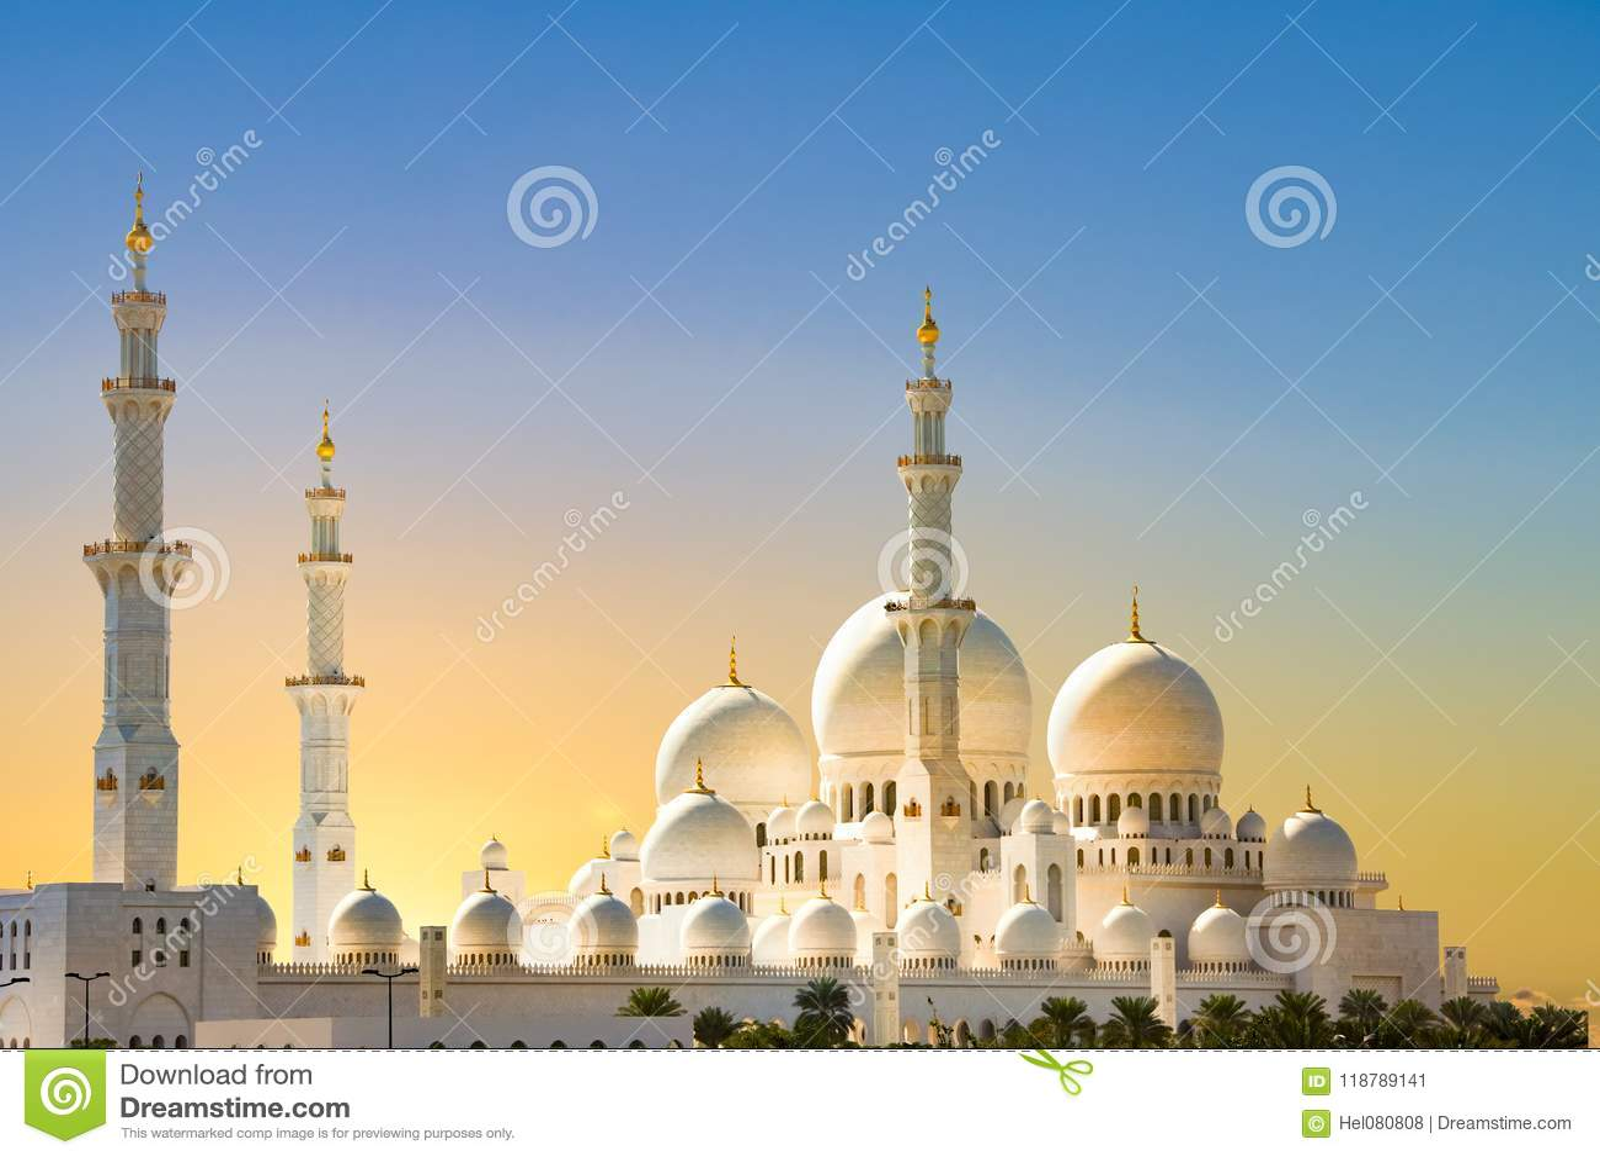 Sheikh Zayed Grand Mosque, Abu Dhabi, sunrise at grand mosque, Abu Dhabi